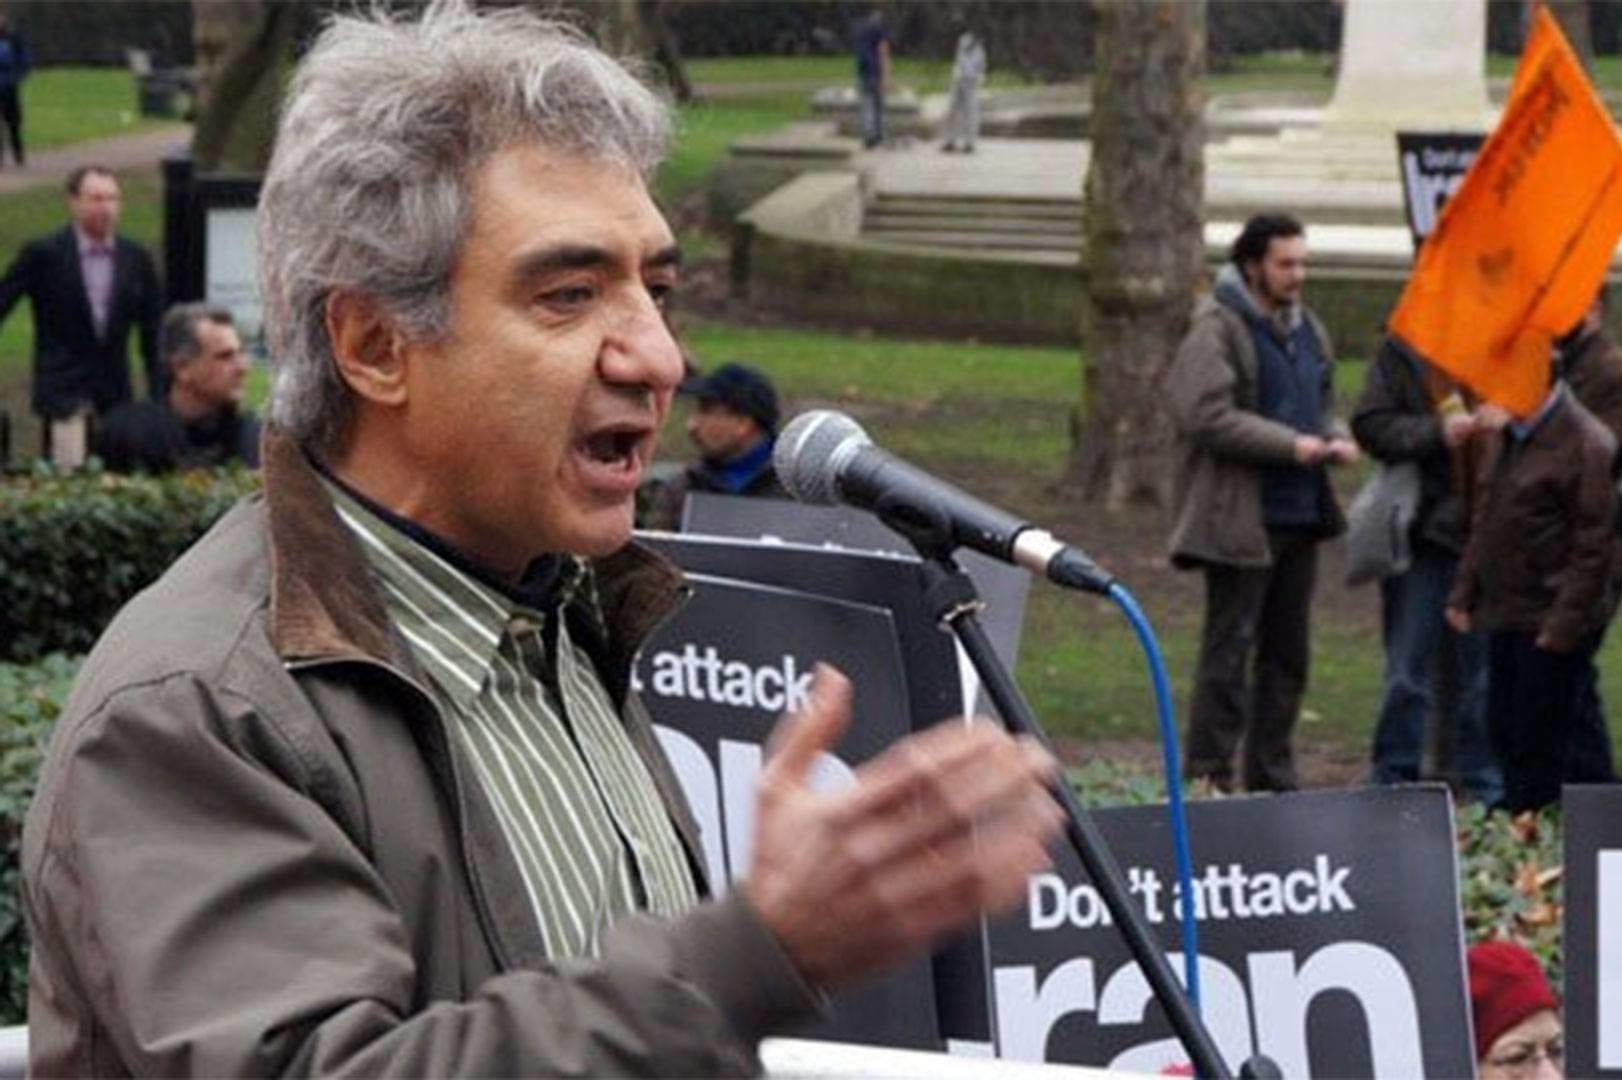 British-Iranian professor returns to United Kingdom  after detention in Iran